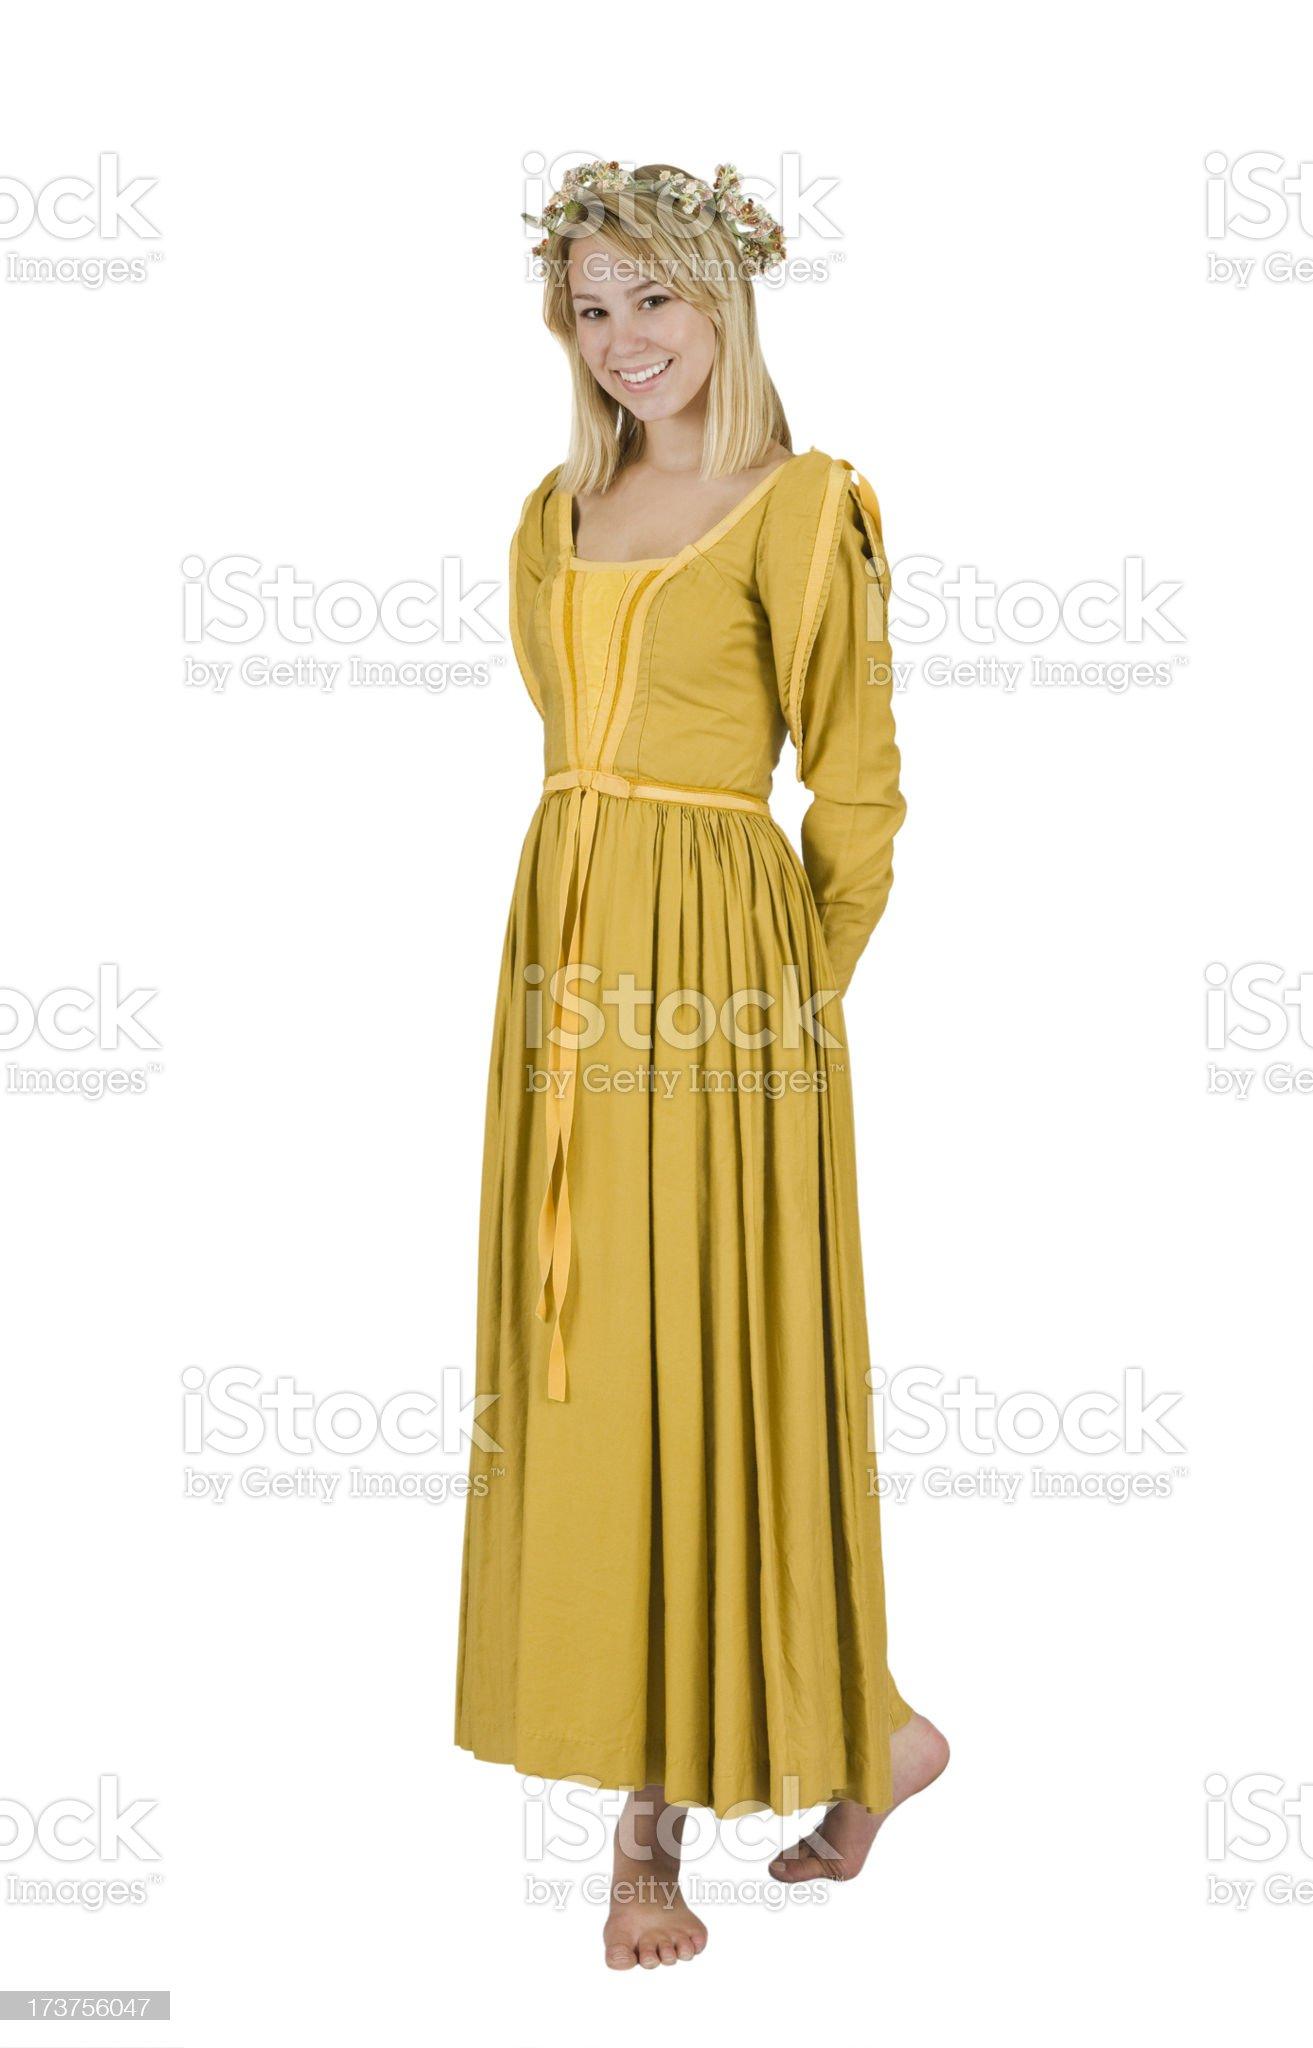 Teen Girl Wearing Renaissance Period Dress Halloween Costume royalty-free stock photo